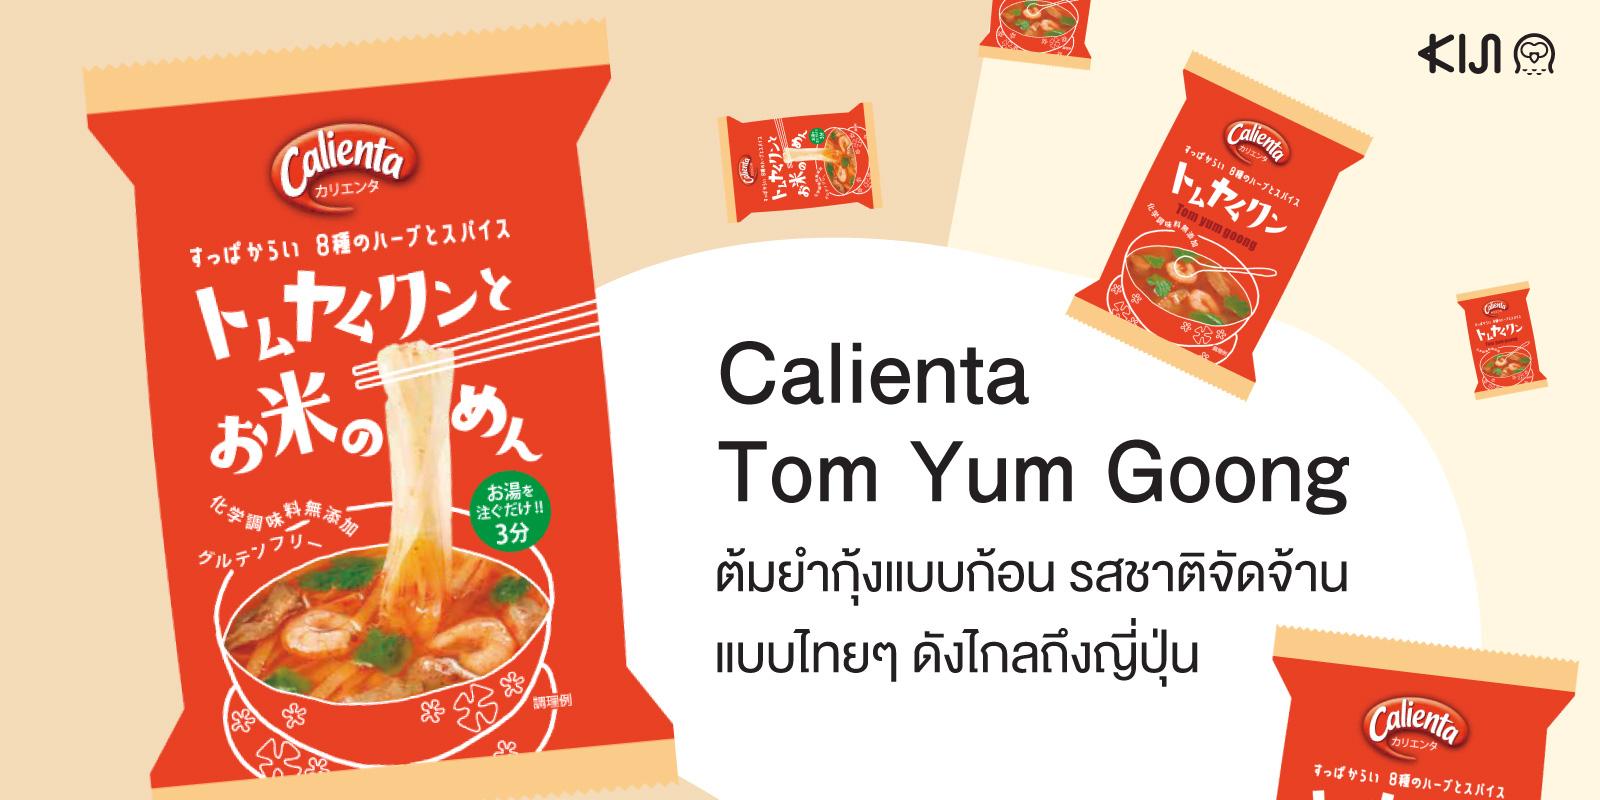 Calienta Tom Yum Goong ต้มยำกุ้งแบบก้อน และ ก๋วยเตี๋ยวต้มยำกุ้งรสจัดจ้านแบบไทยๆ ในญี่ปุ่ร